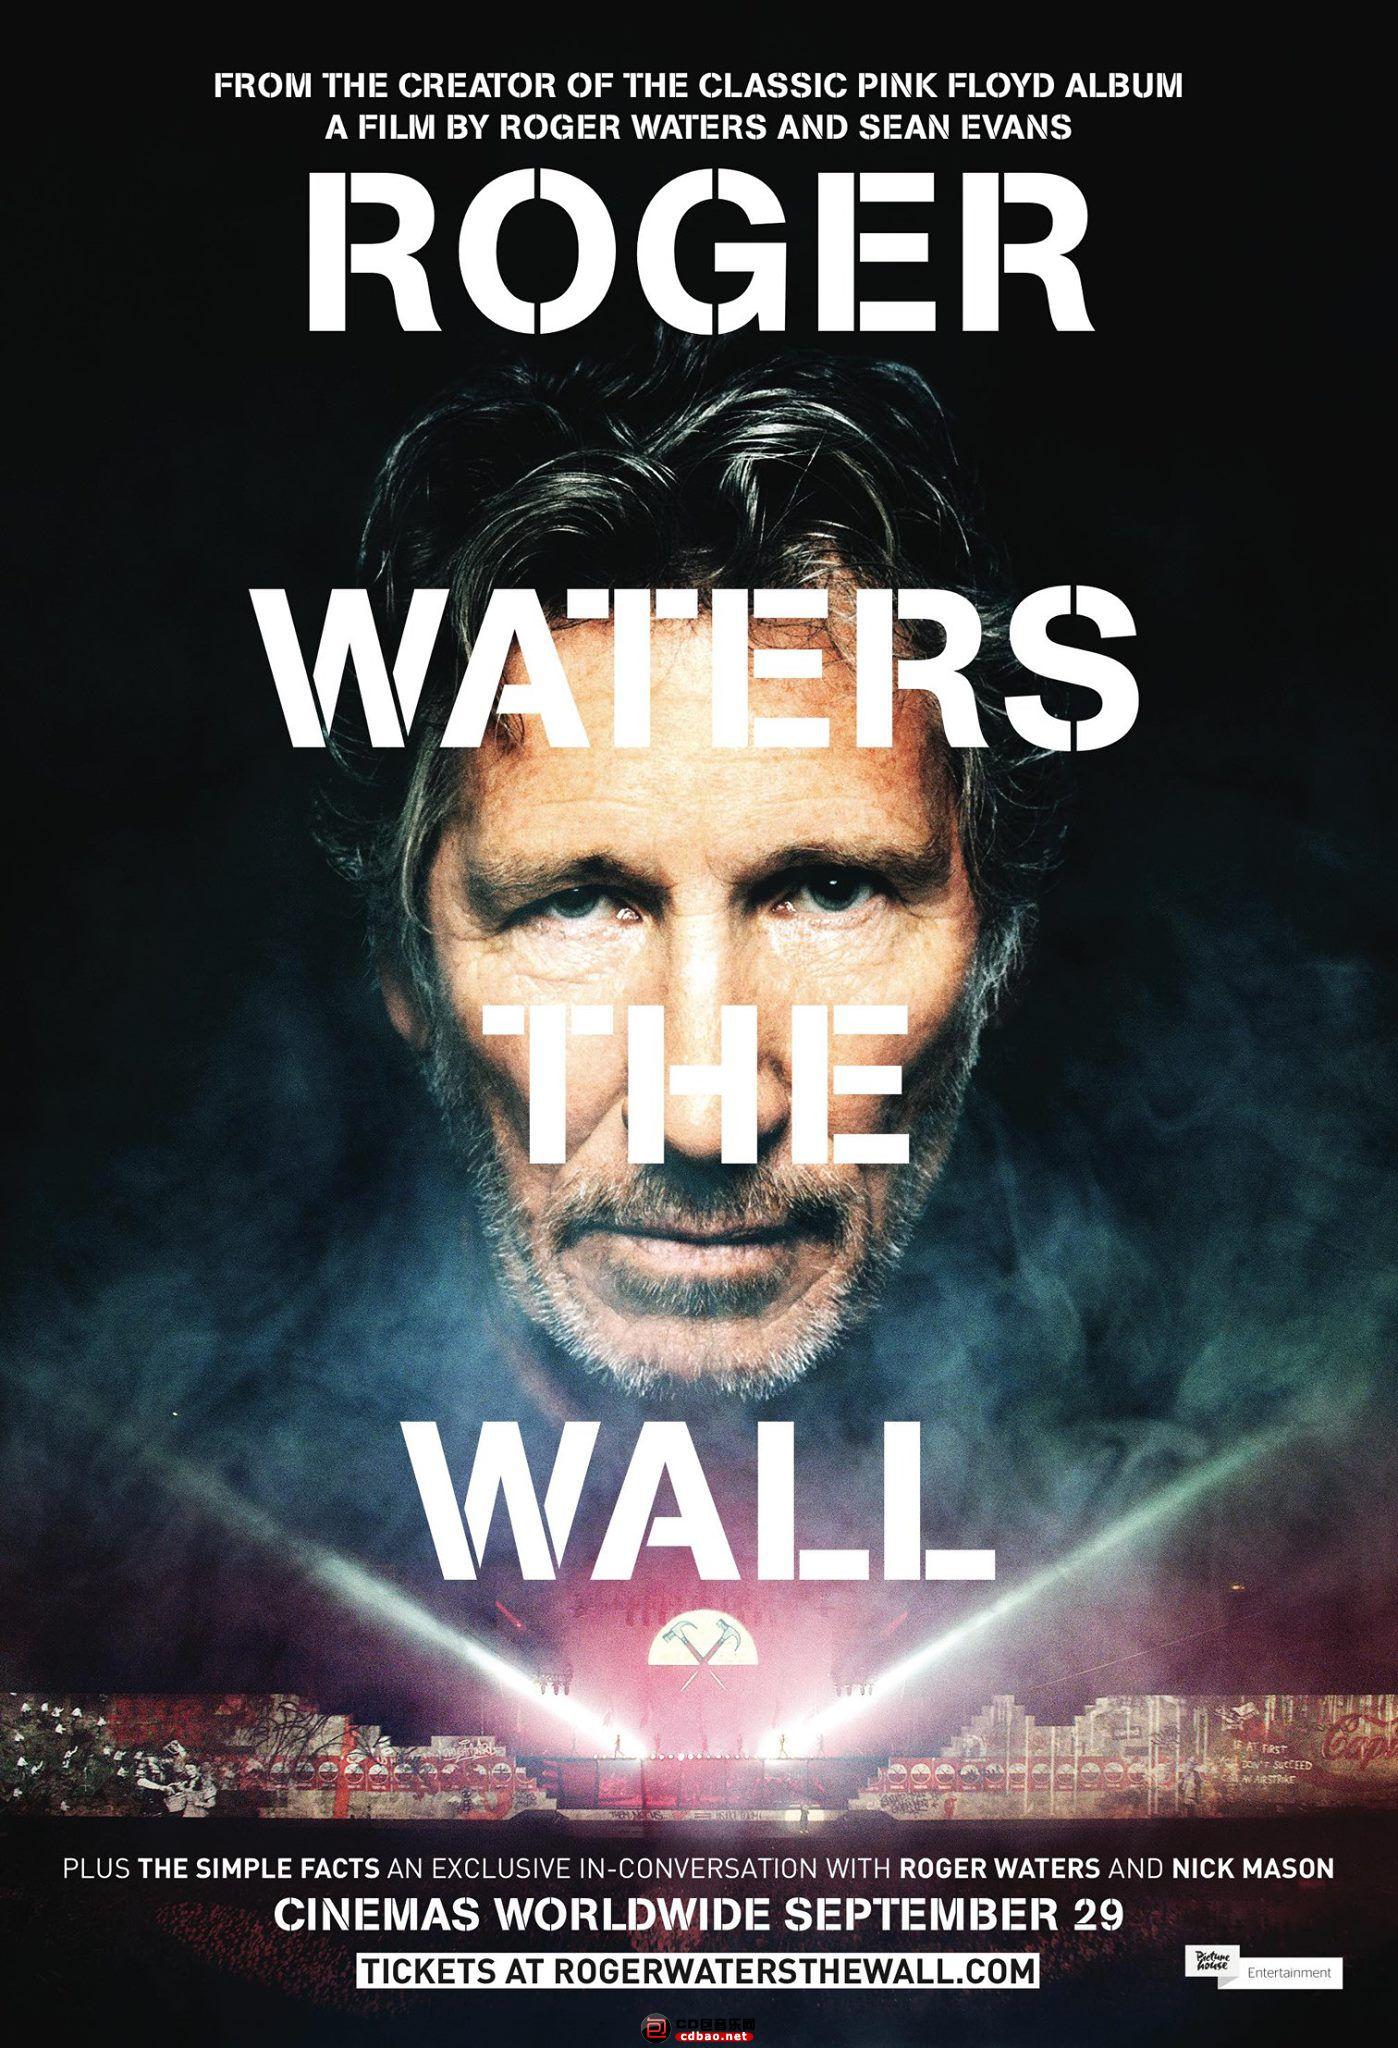 Roger-Waters-The-Wall-Film-2015.jpg